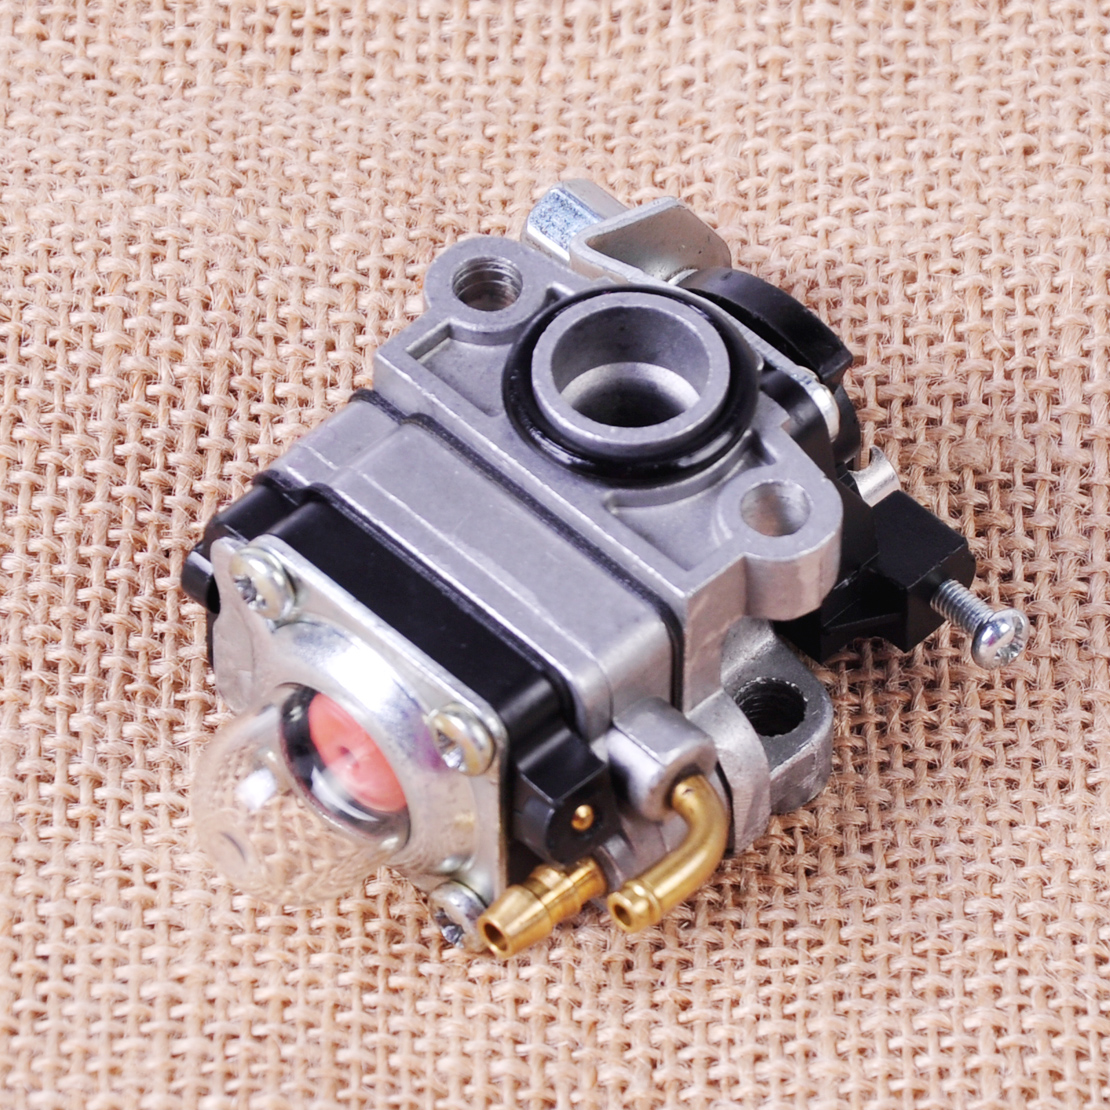 LETAOSK Carburetor Carb for HONDA GX31 GX22 FG100 4 Cycle Tillers Engine 16100-ZM5-803LETAOSK Carburetor Carb for HONDA GX31 GX22 FG100 4 Cycle Tillers Engine 16100-ZM5-803